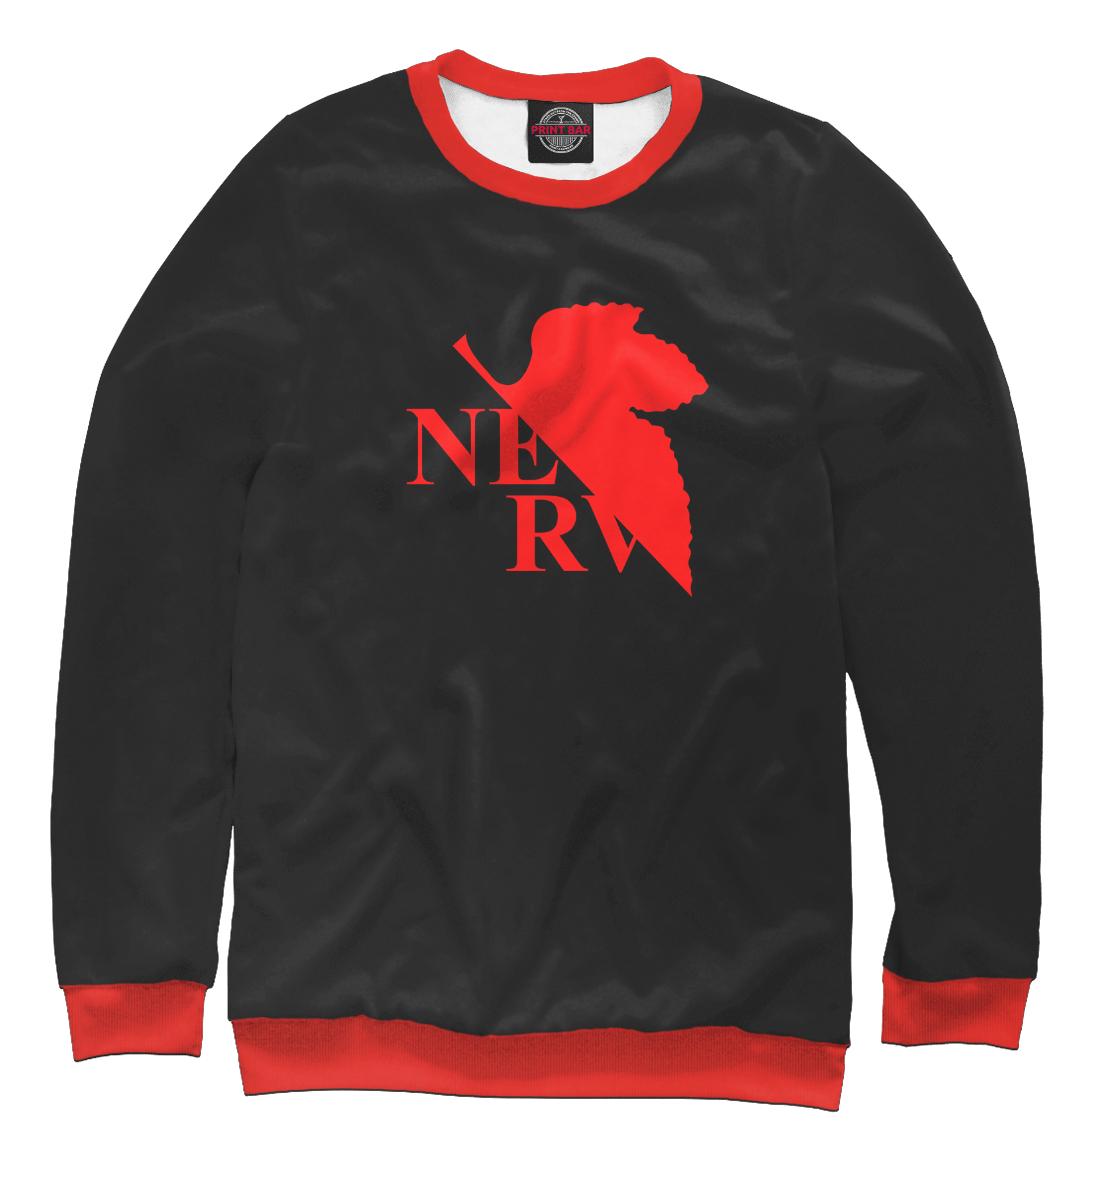 Купить Evangelion NERV Black style, Printbar, Свитшоты, APD-132191-swi-2